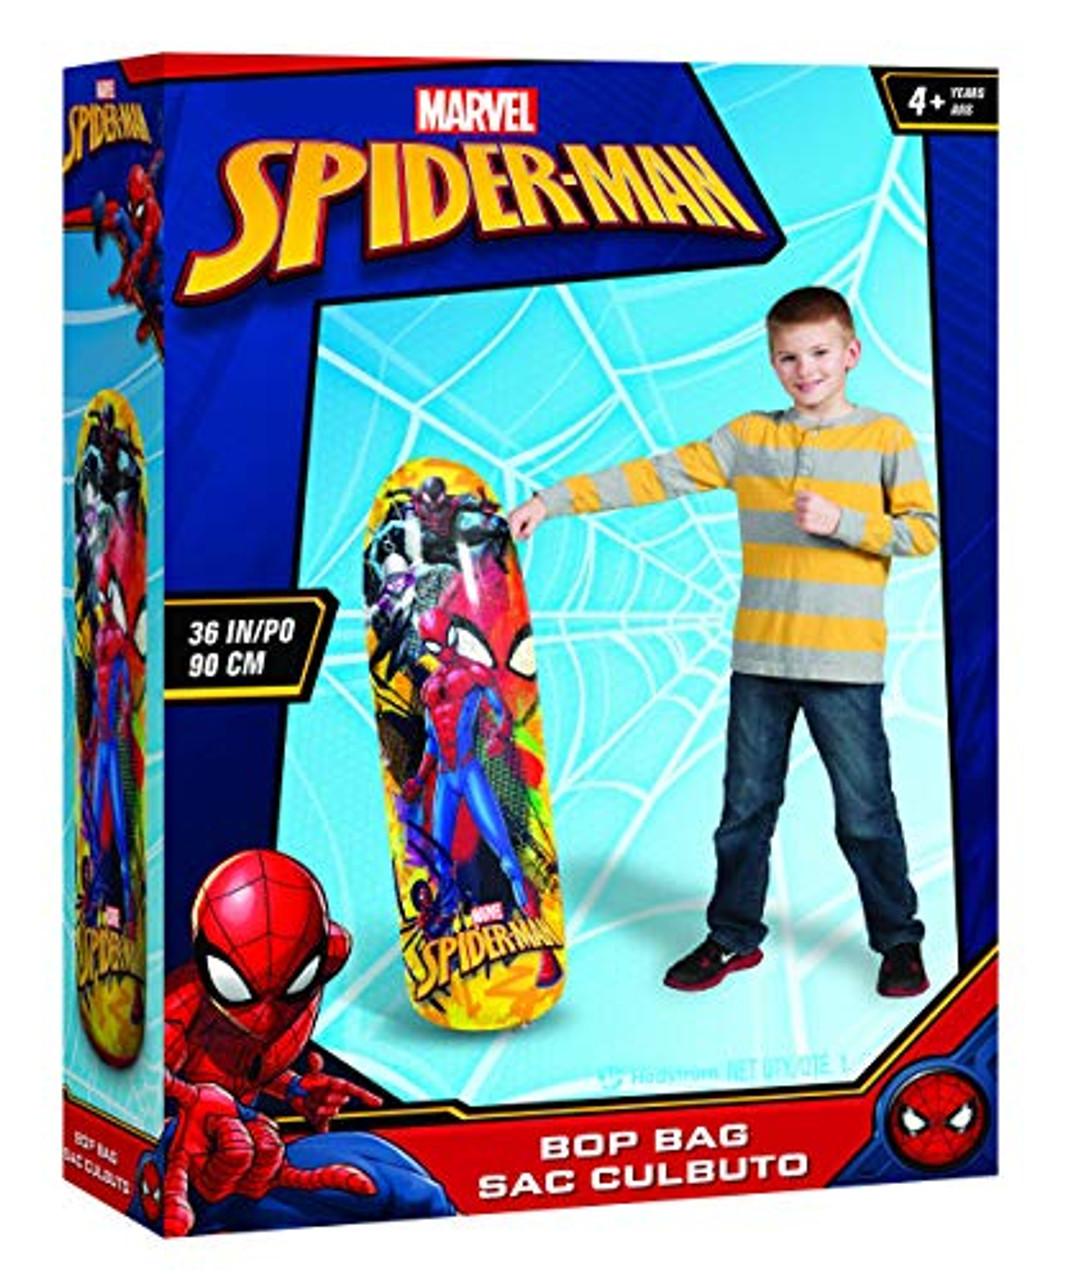 NEW!! Spider-man Marvel Comics Superhero Bop Ball